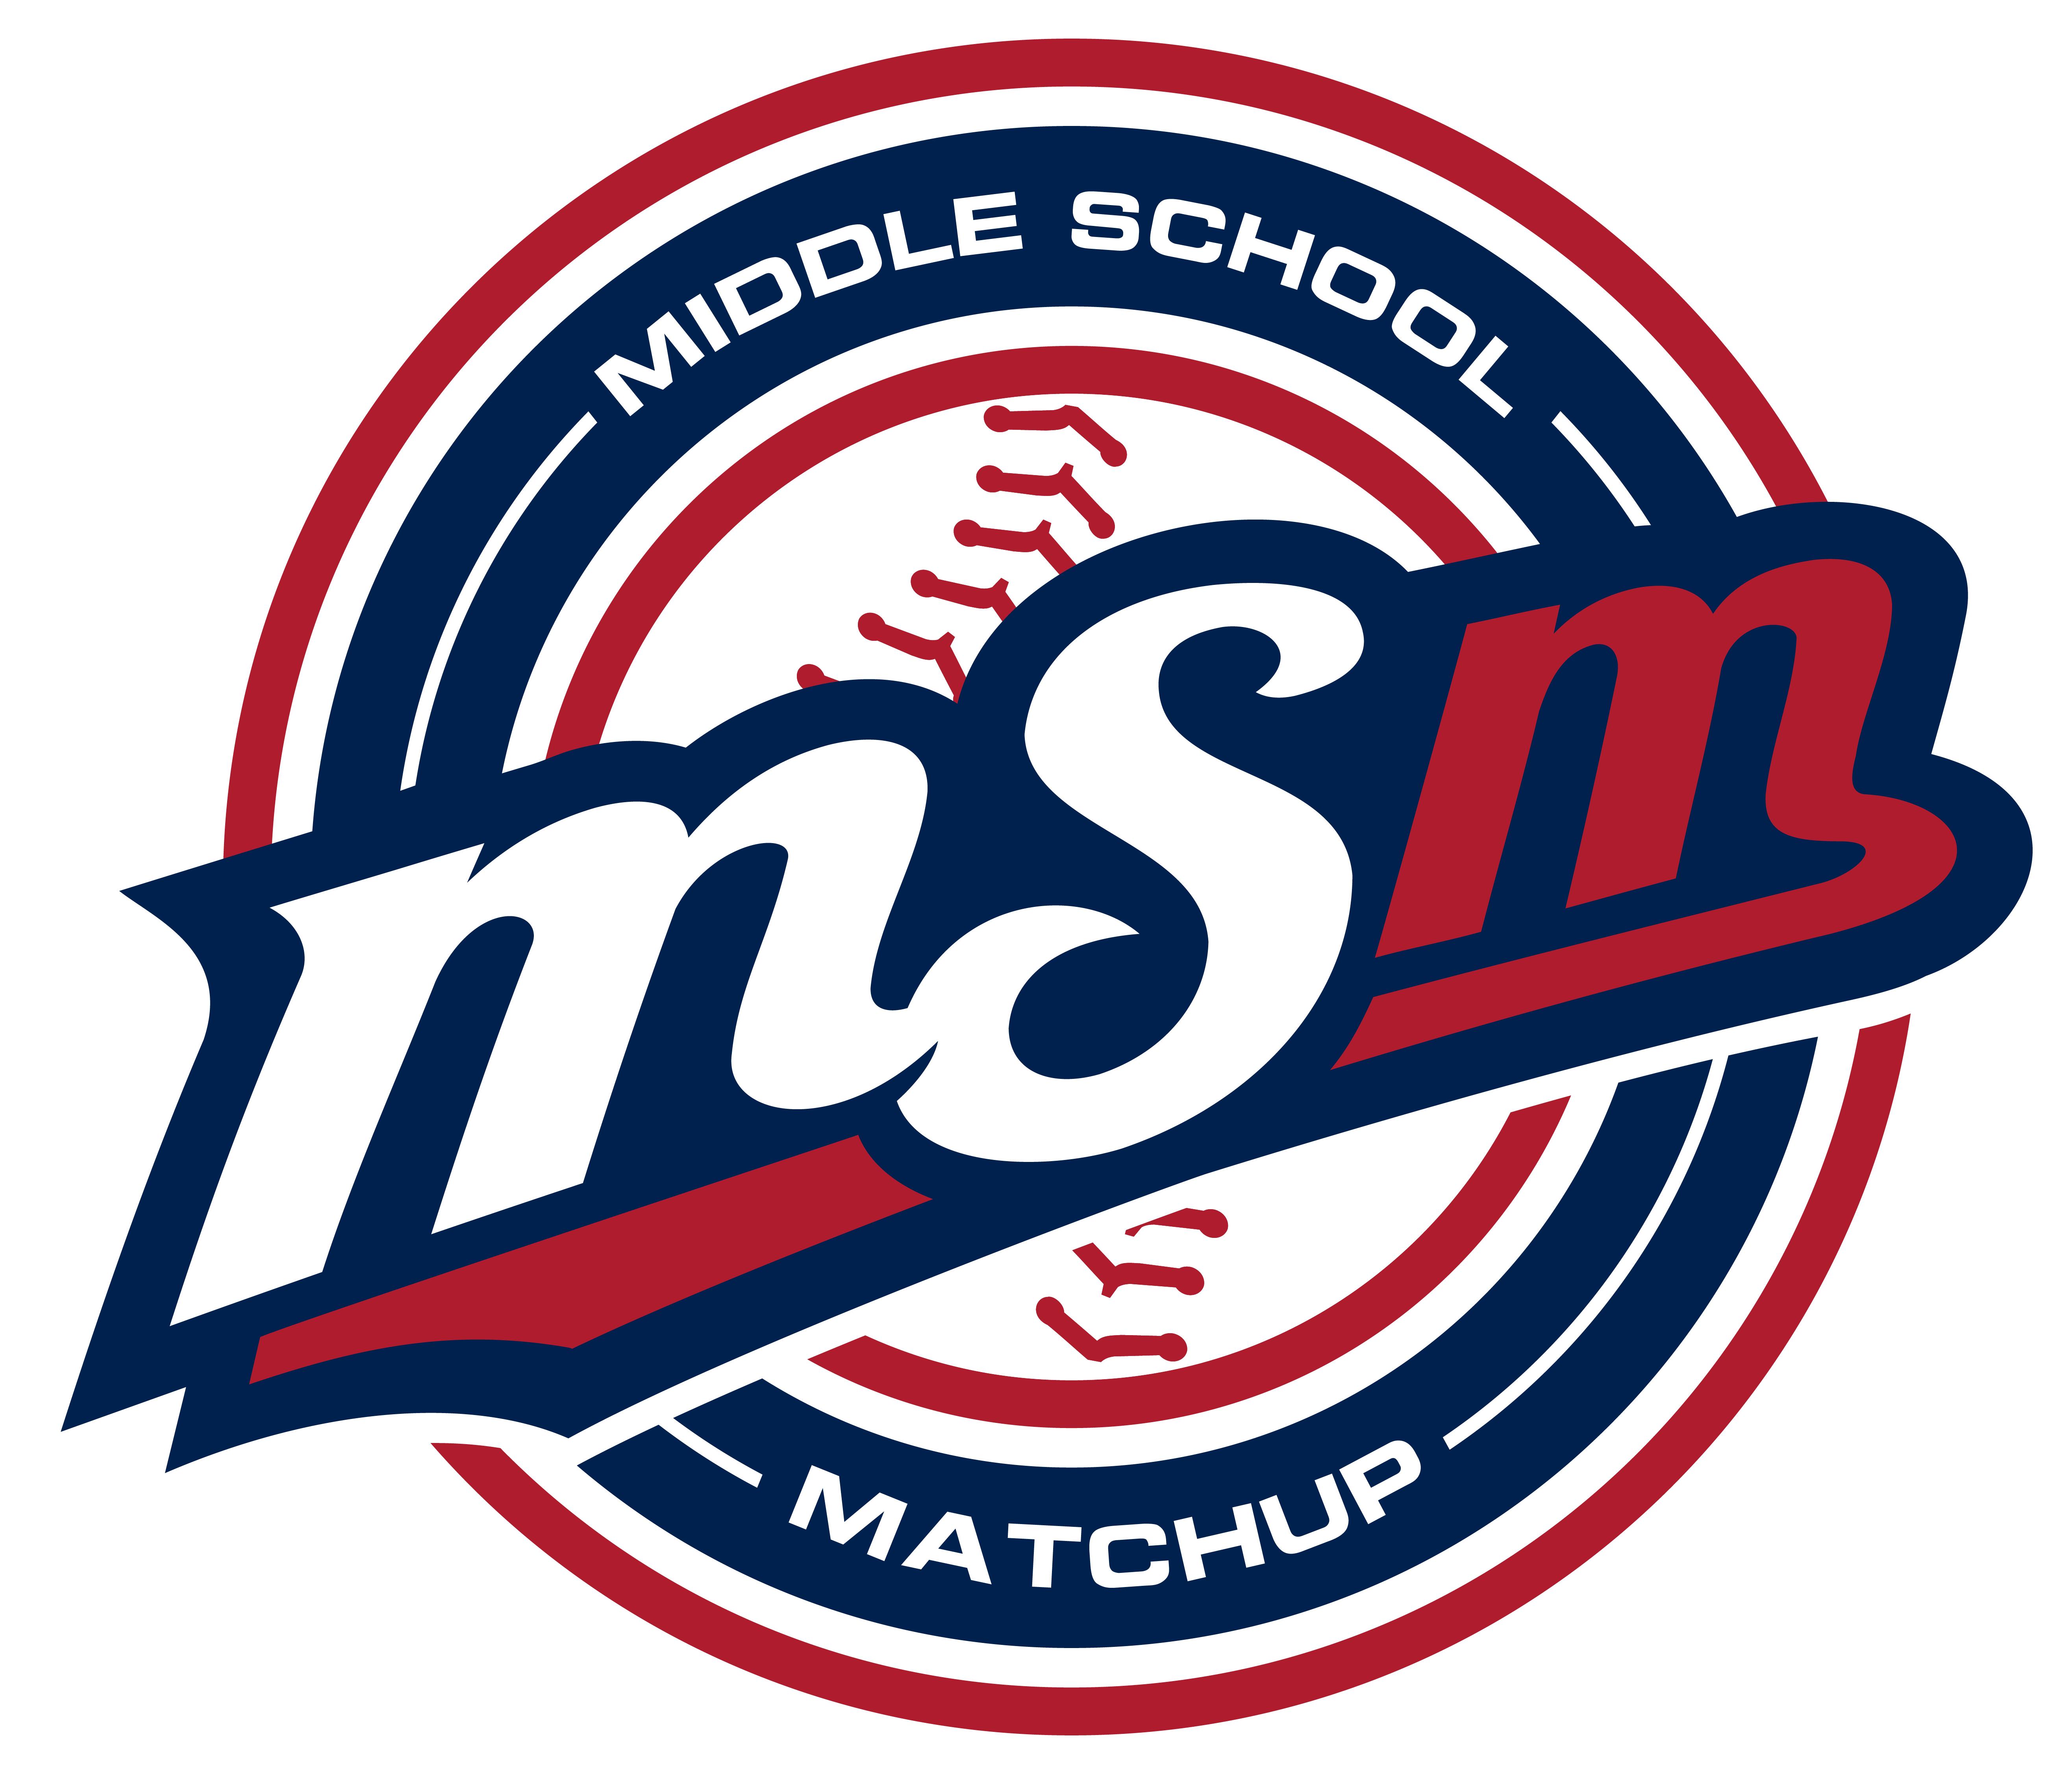 HAPPYBASEBALL - Middle School Baseball Championships